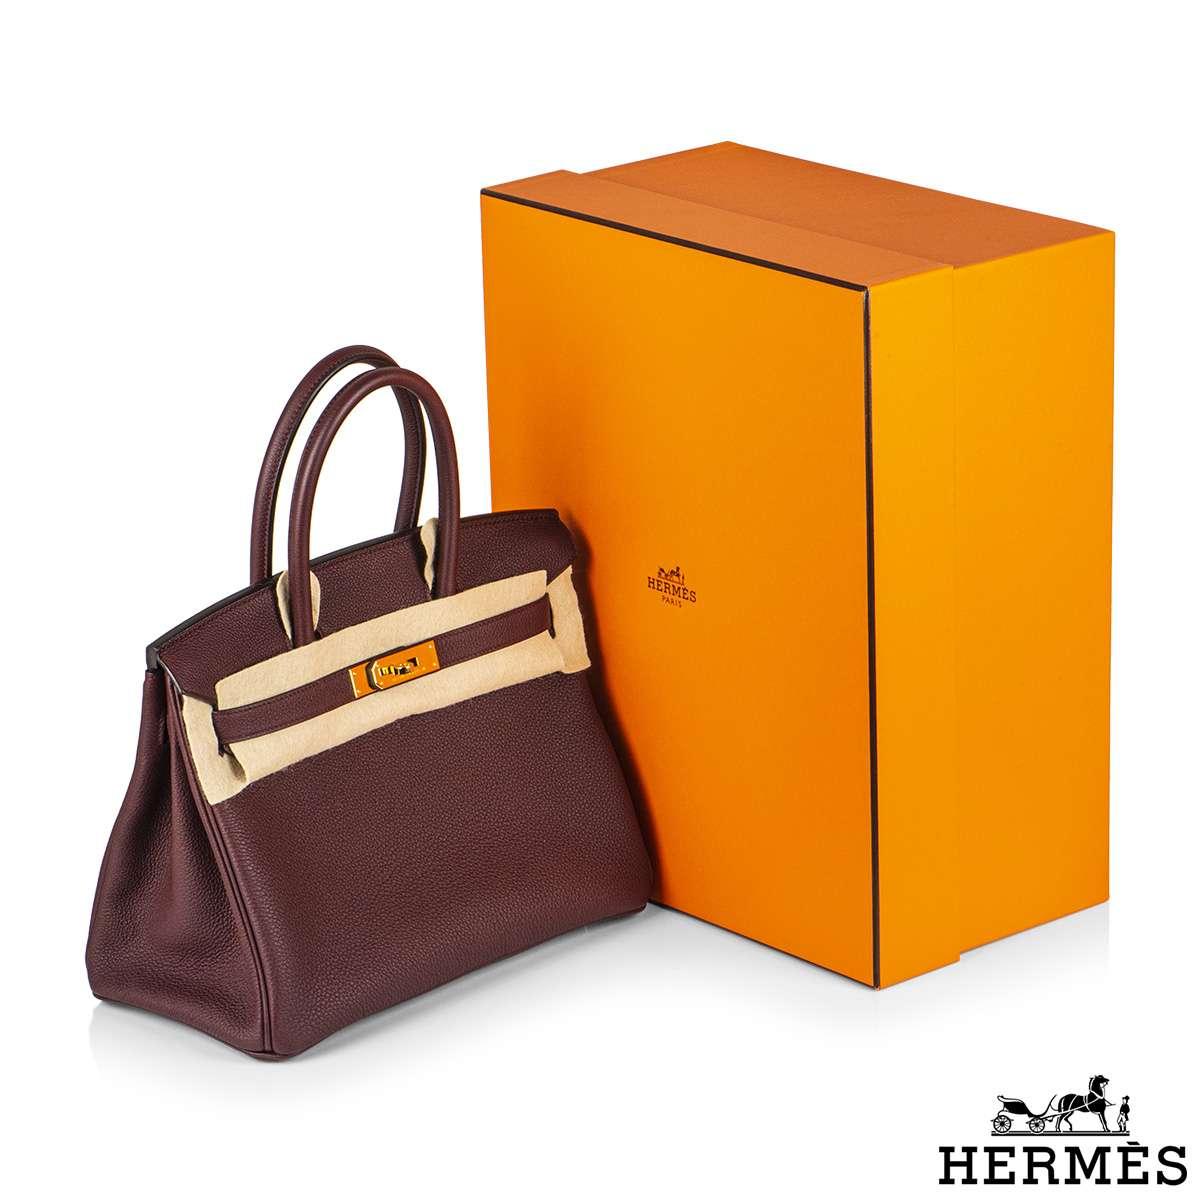 Hermès Birkin 30 Togo Bordeaux GHW